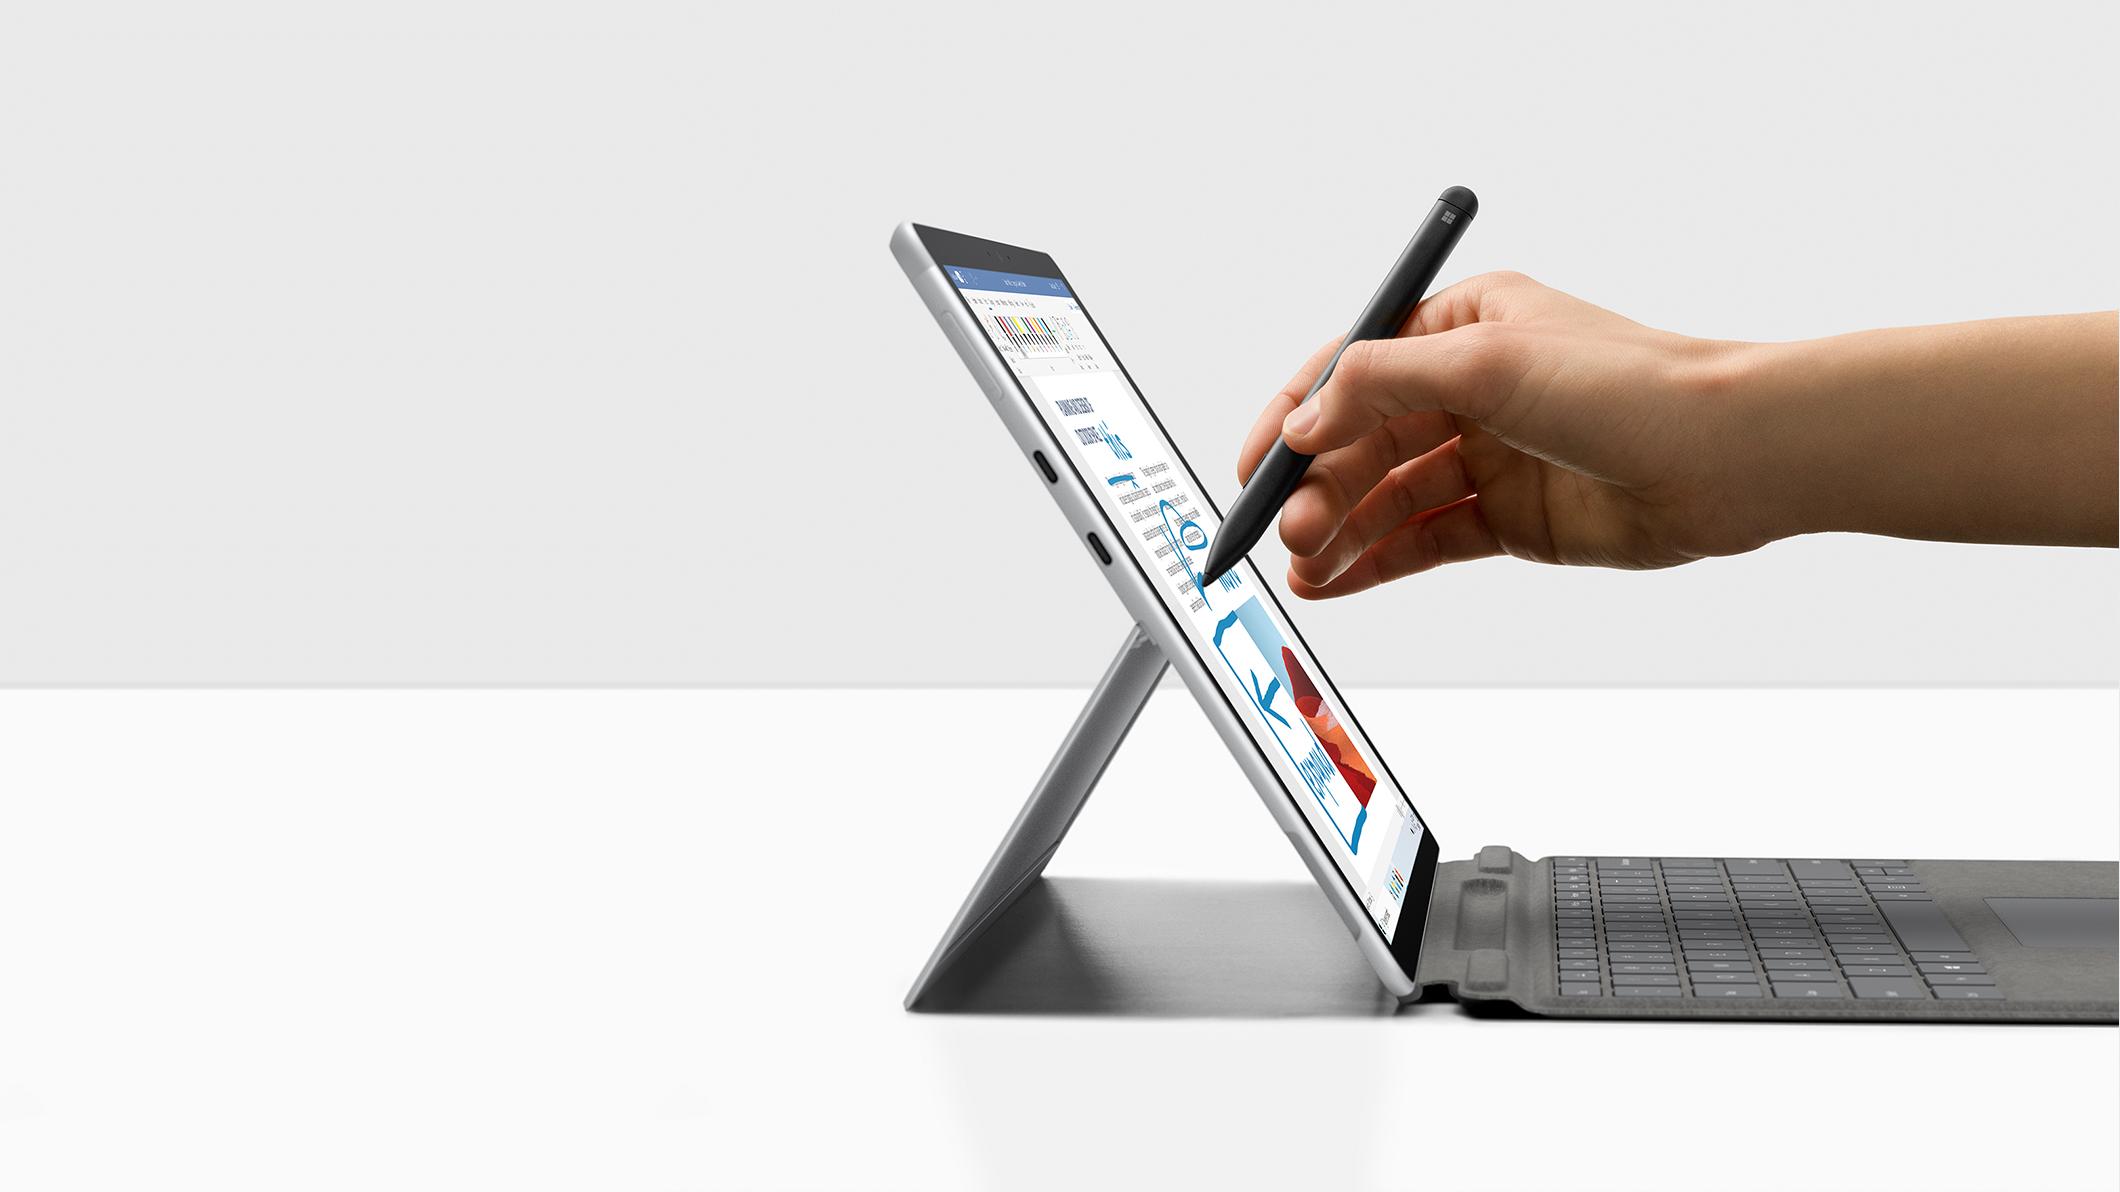 Surface Pro X Portatil 2 Em 1 Ultrafino E Sempre Conectado Microsoft Surface